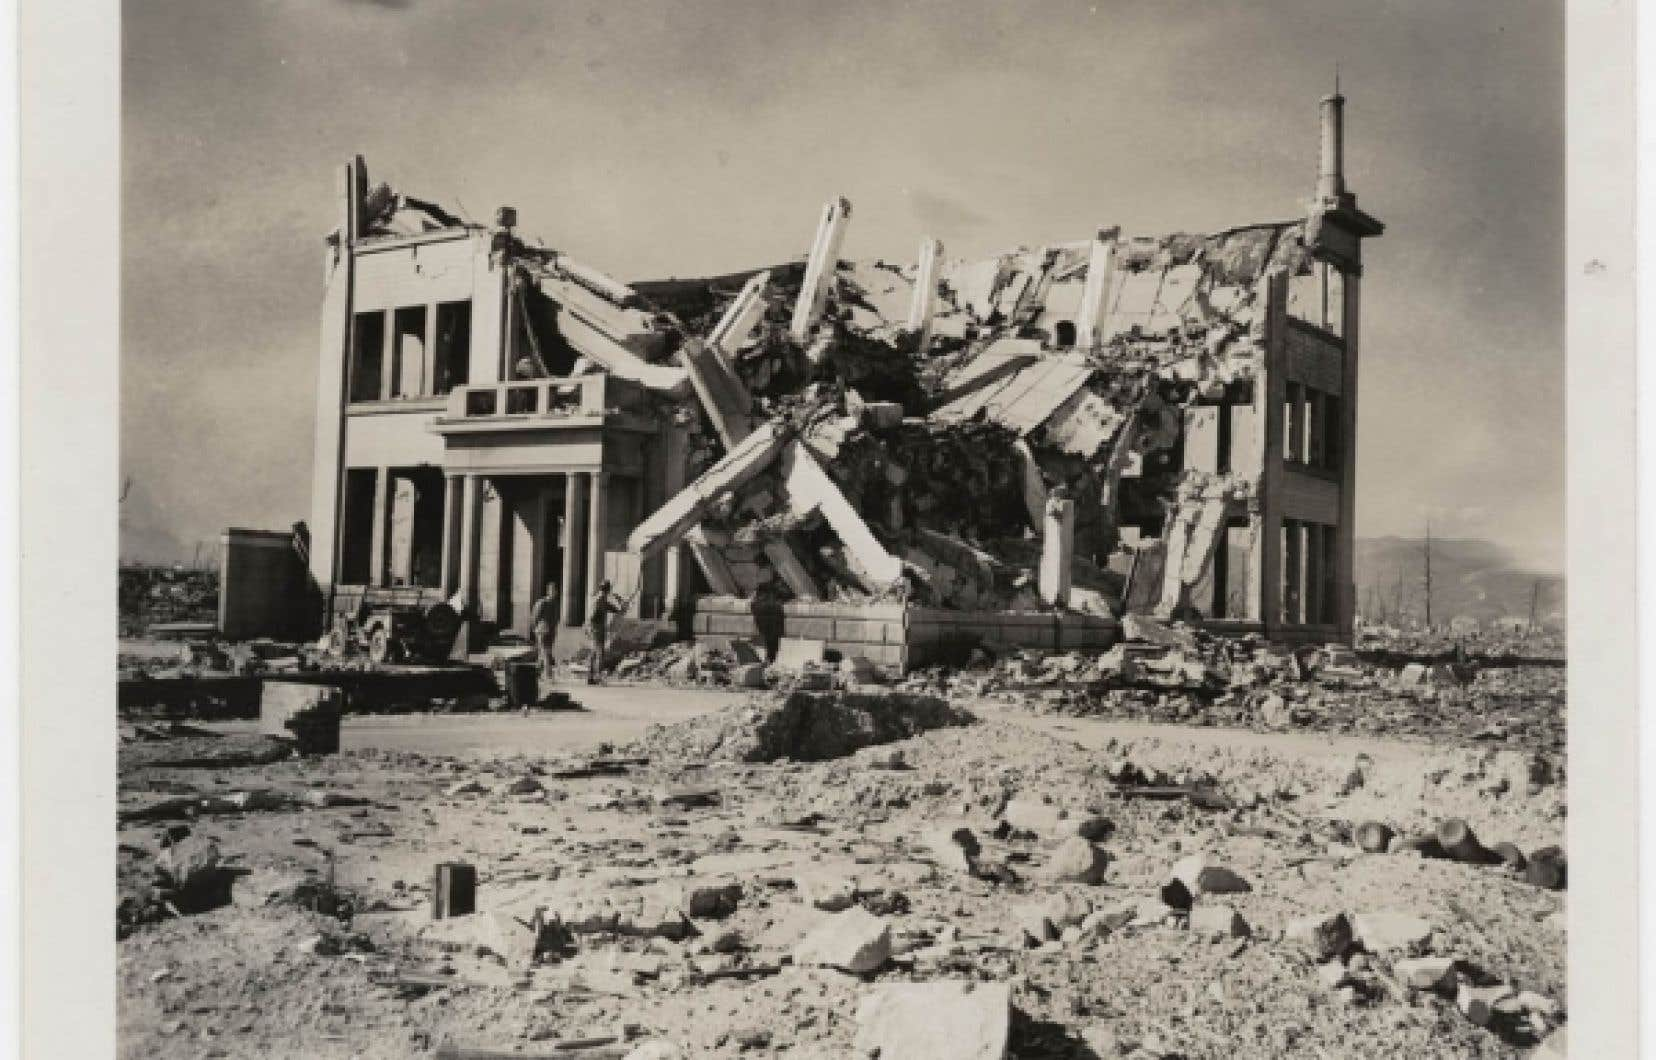 Ruines de la compagnie de distribution de gaz Chugoku, 8 novembre 1945. &laquo;United States Strategic Bombing Survey, Physical Damage Division&raquo;.<br /> <br />